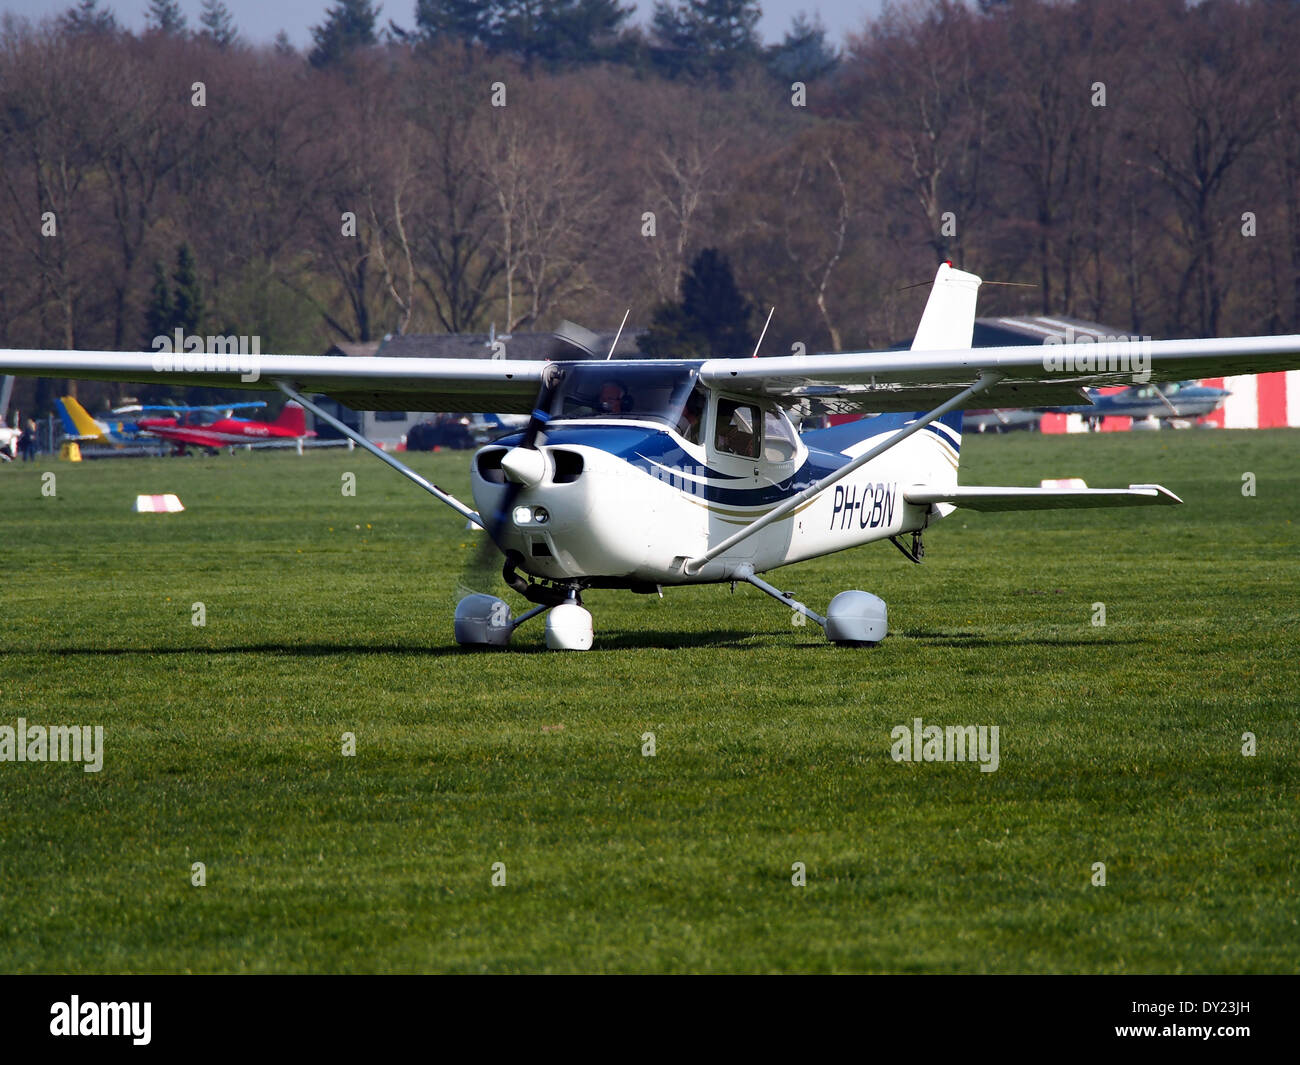 Maak een titel. PH-CBN, Reims F172N Skyhawk in rullaggio a Hilversum Aeroporto (ICAO EHHV), foto1 Immagini Stock